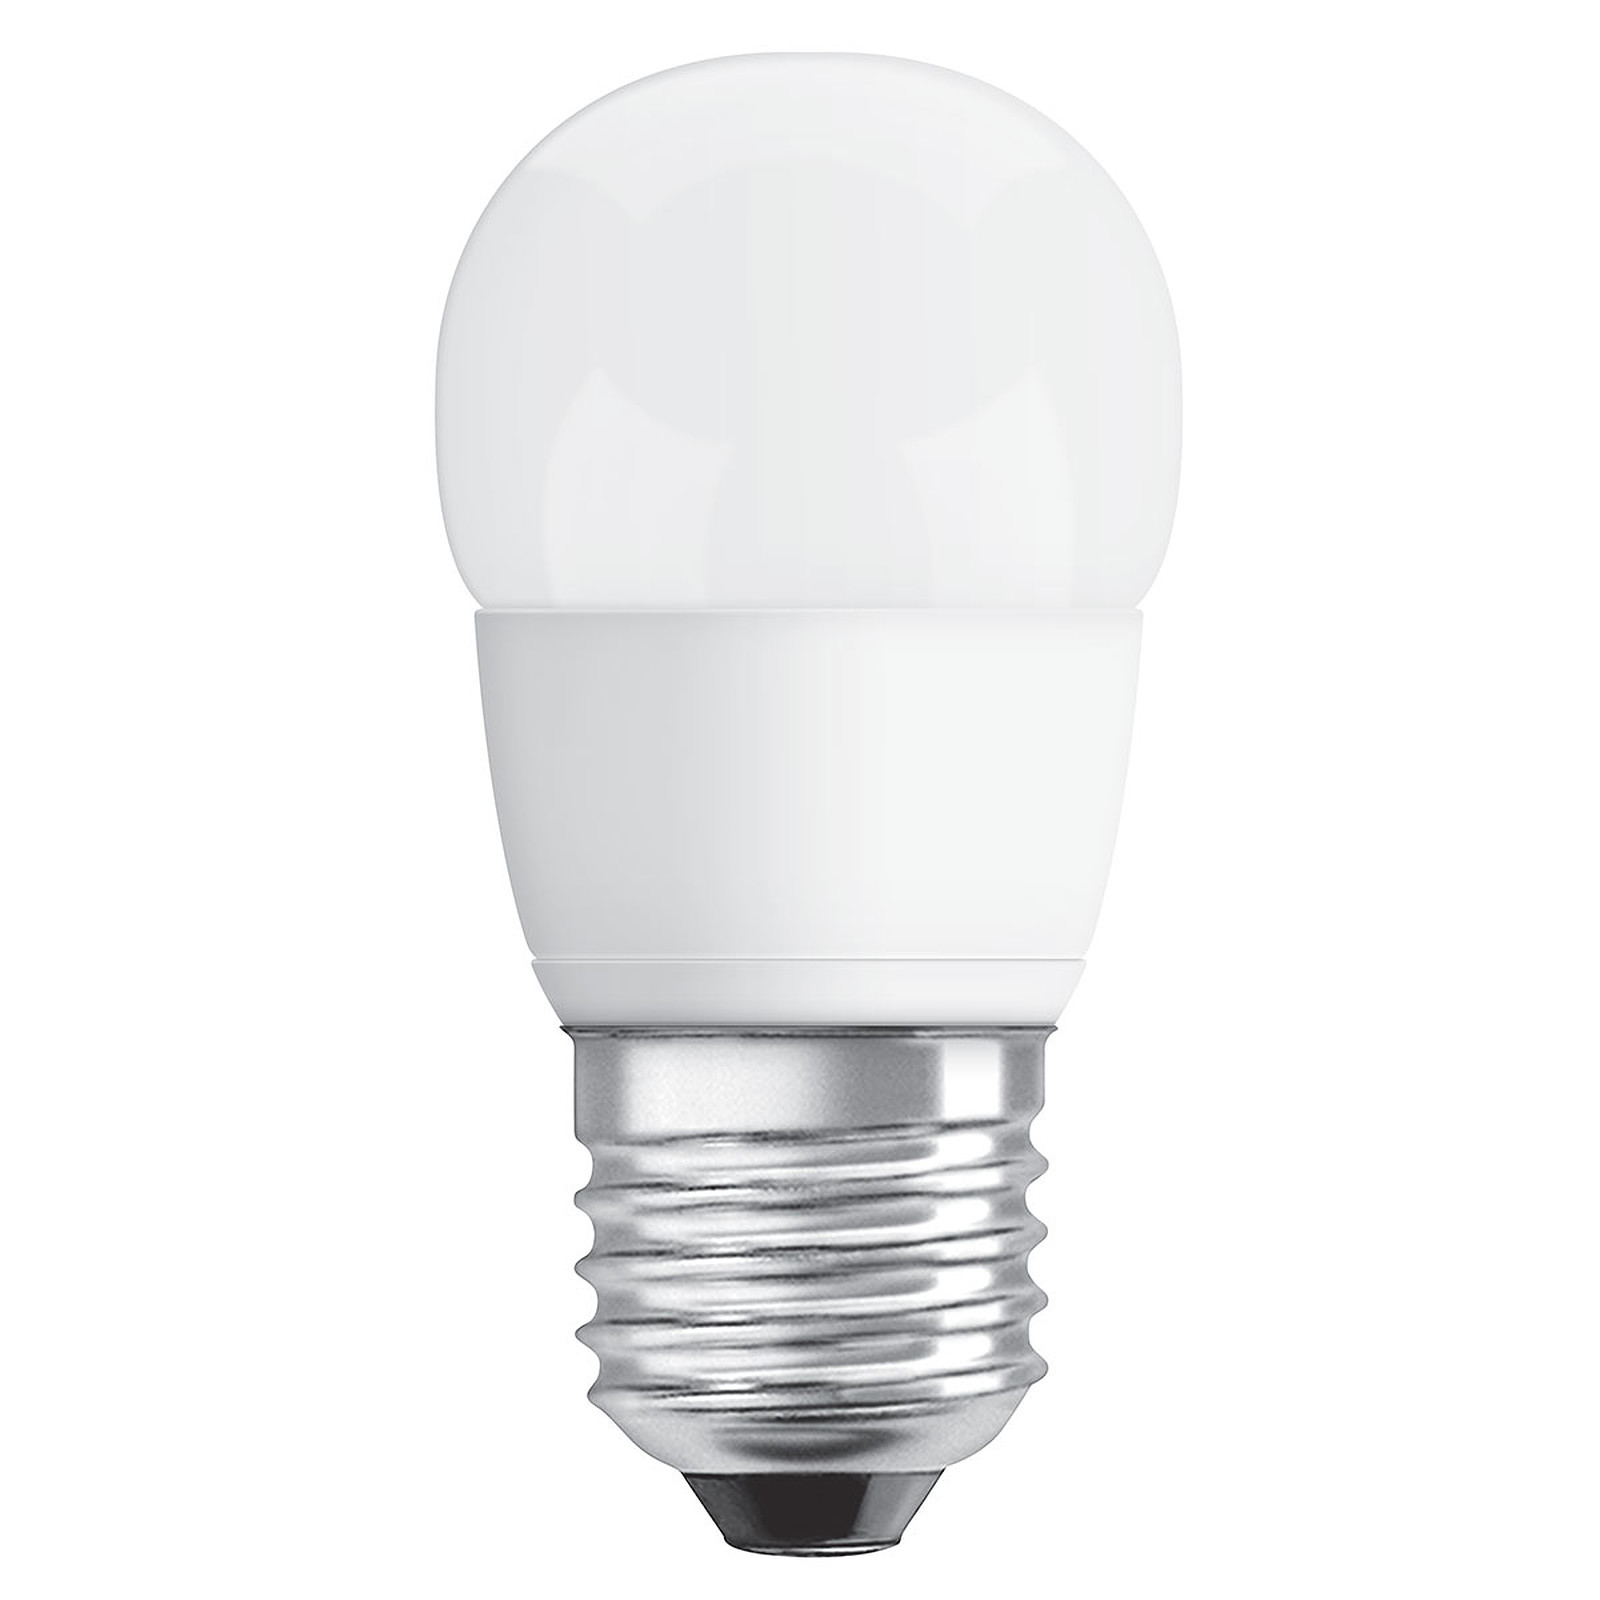 Osram Ampoule Led Retrofit Standard E27 4w 40w A: OSRAM Ampoule LED Superstar Sphérique E27 5.4W (40W) A